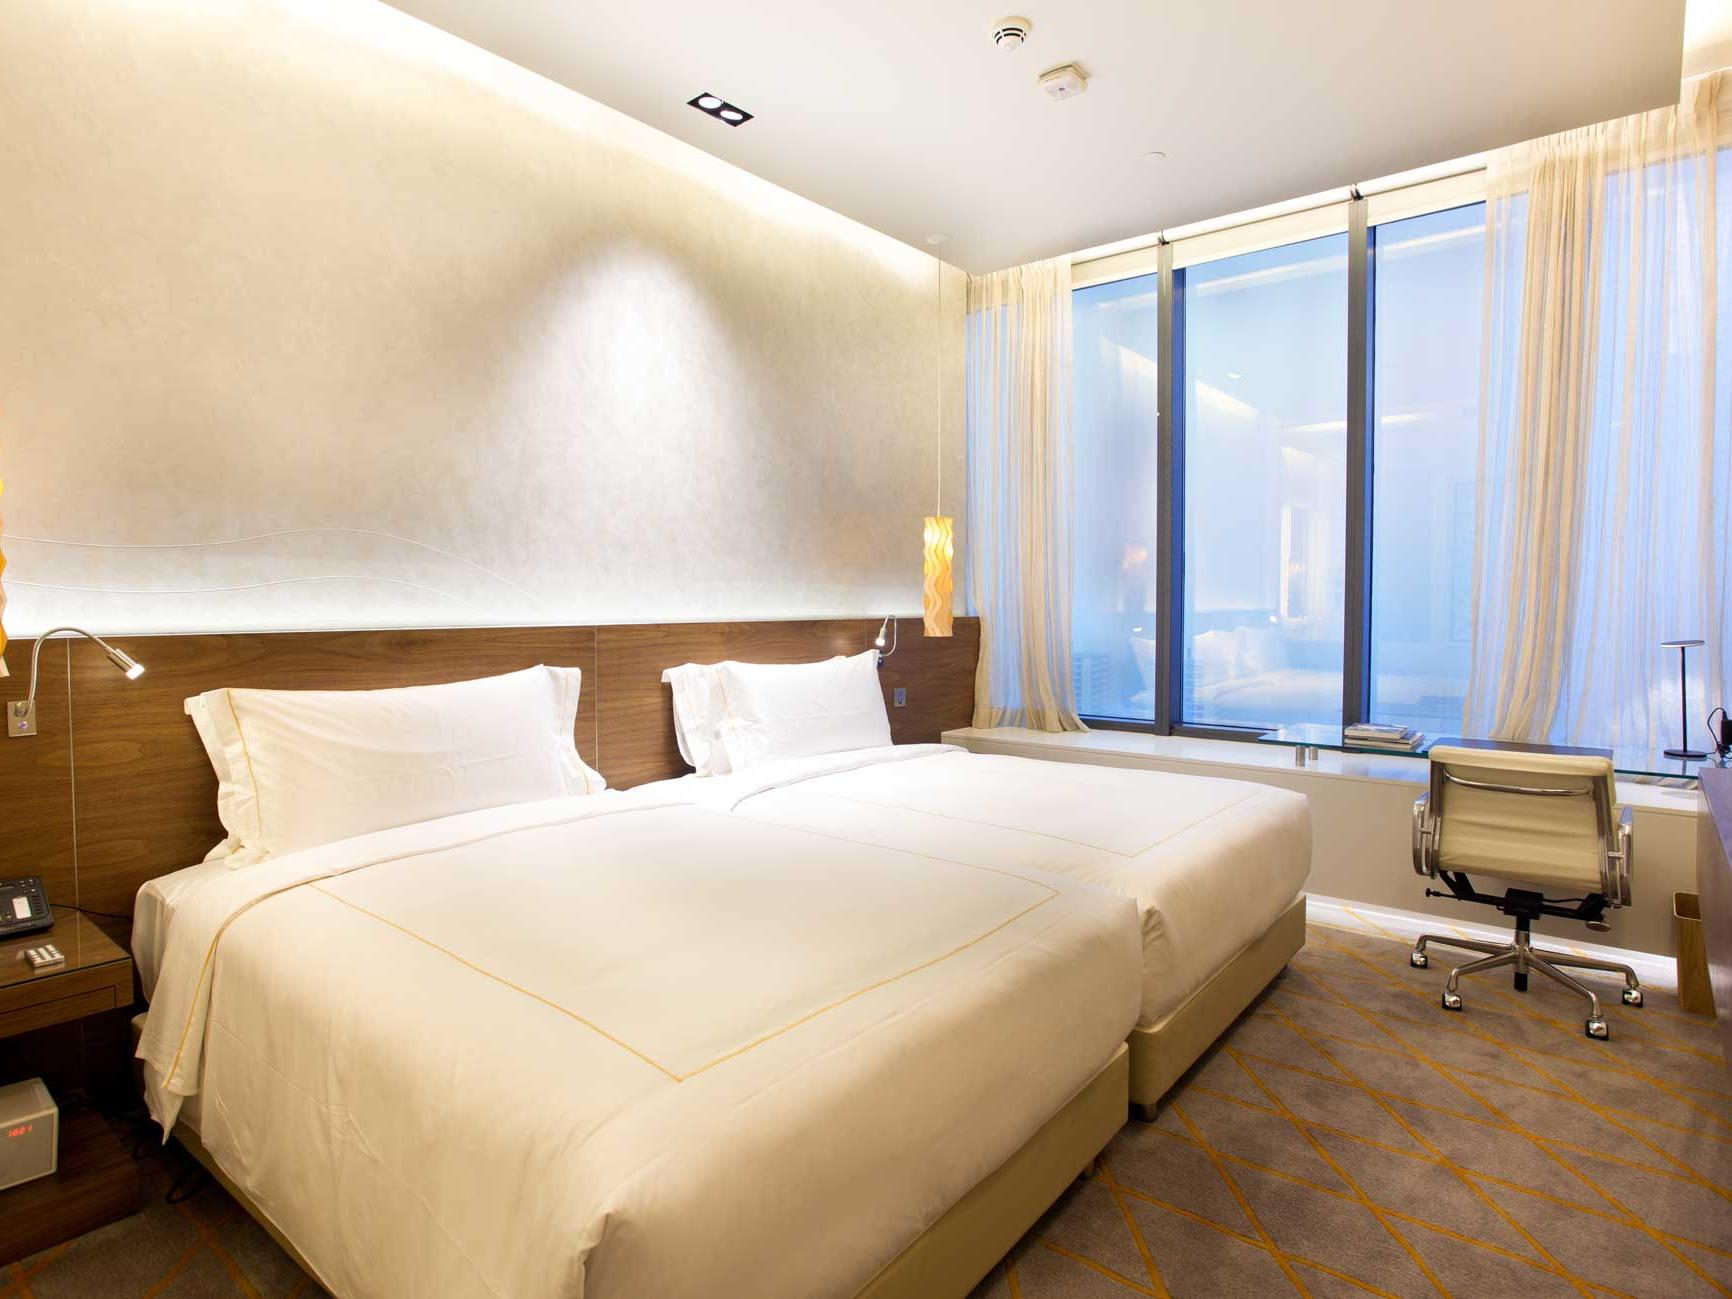 Interior of Jasmine standard bedroom at one farrer hotel